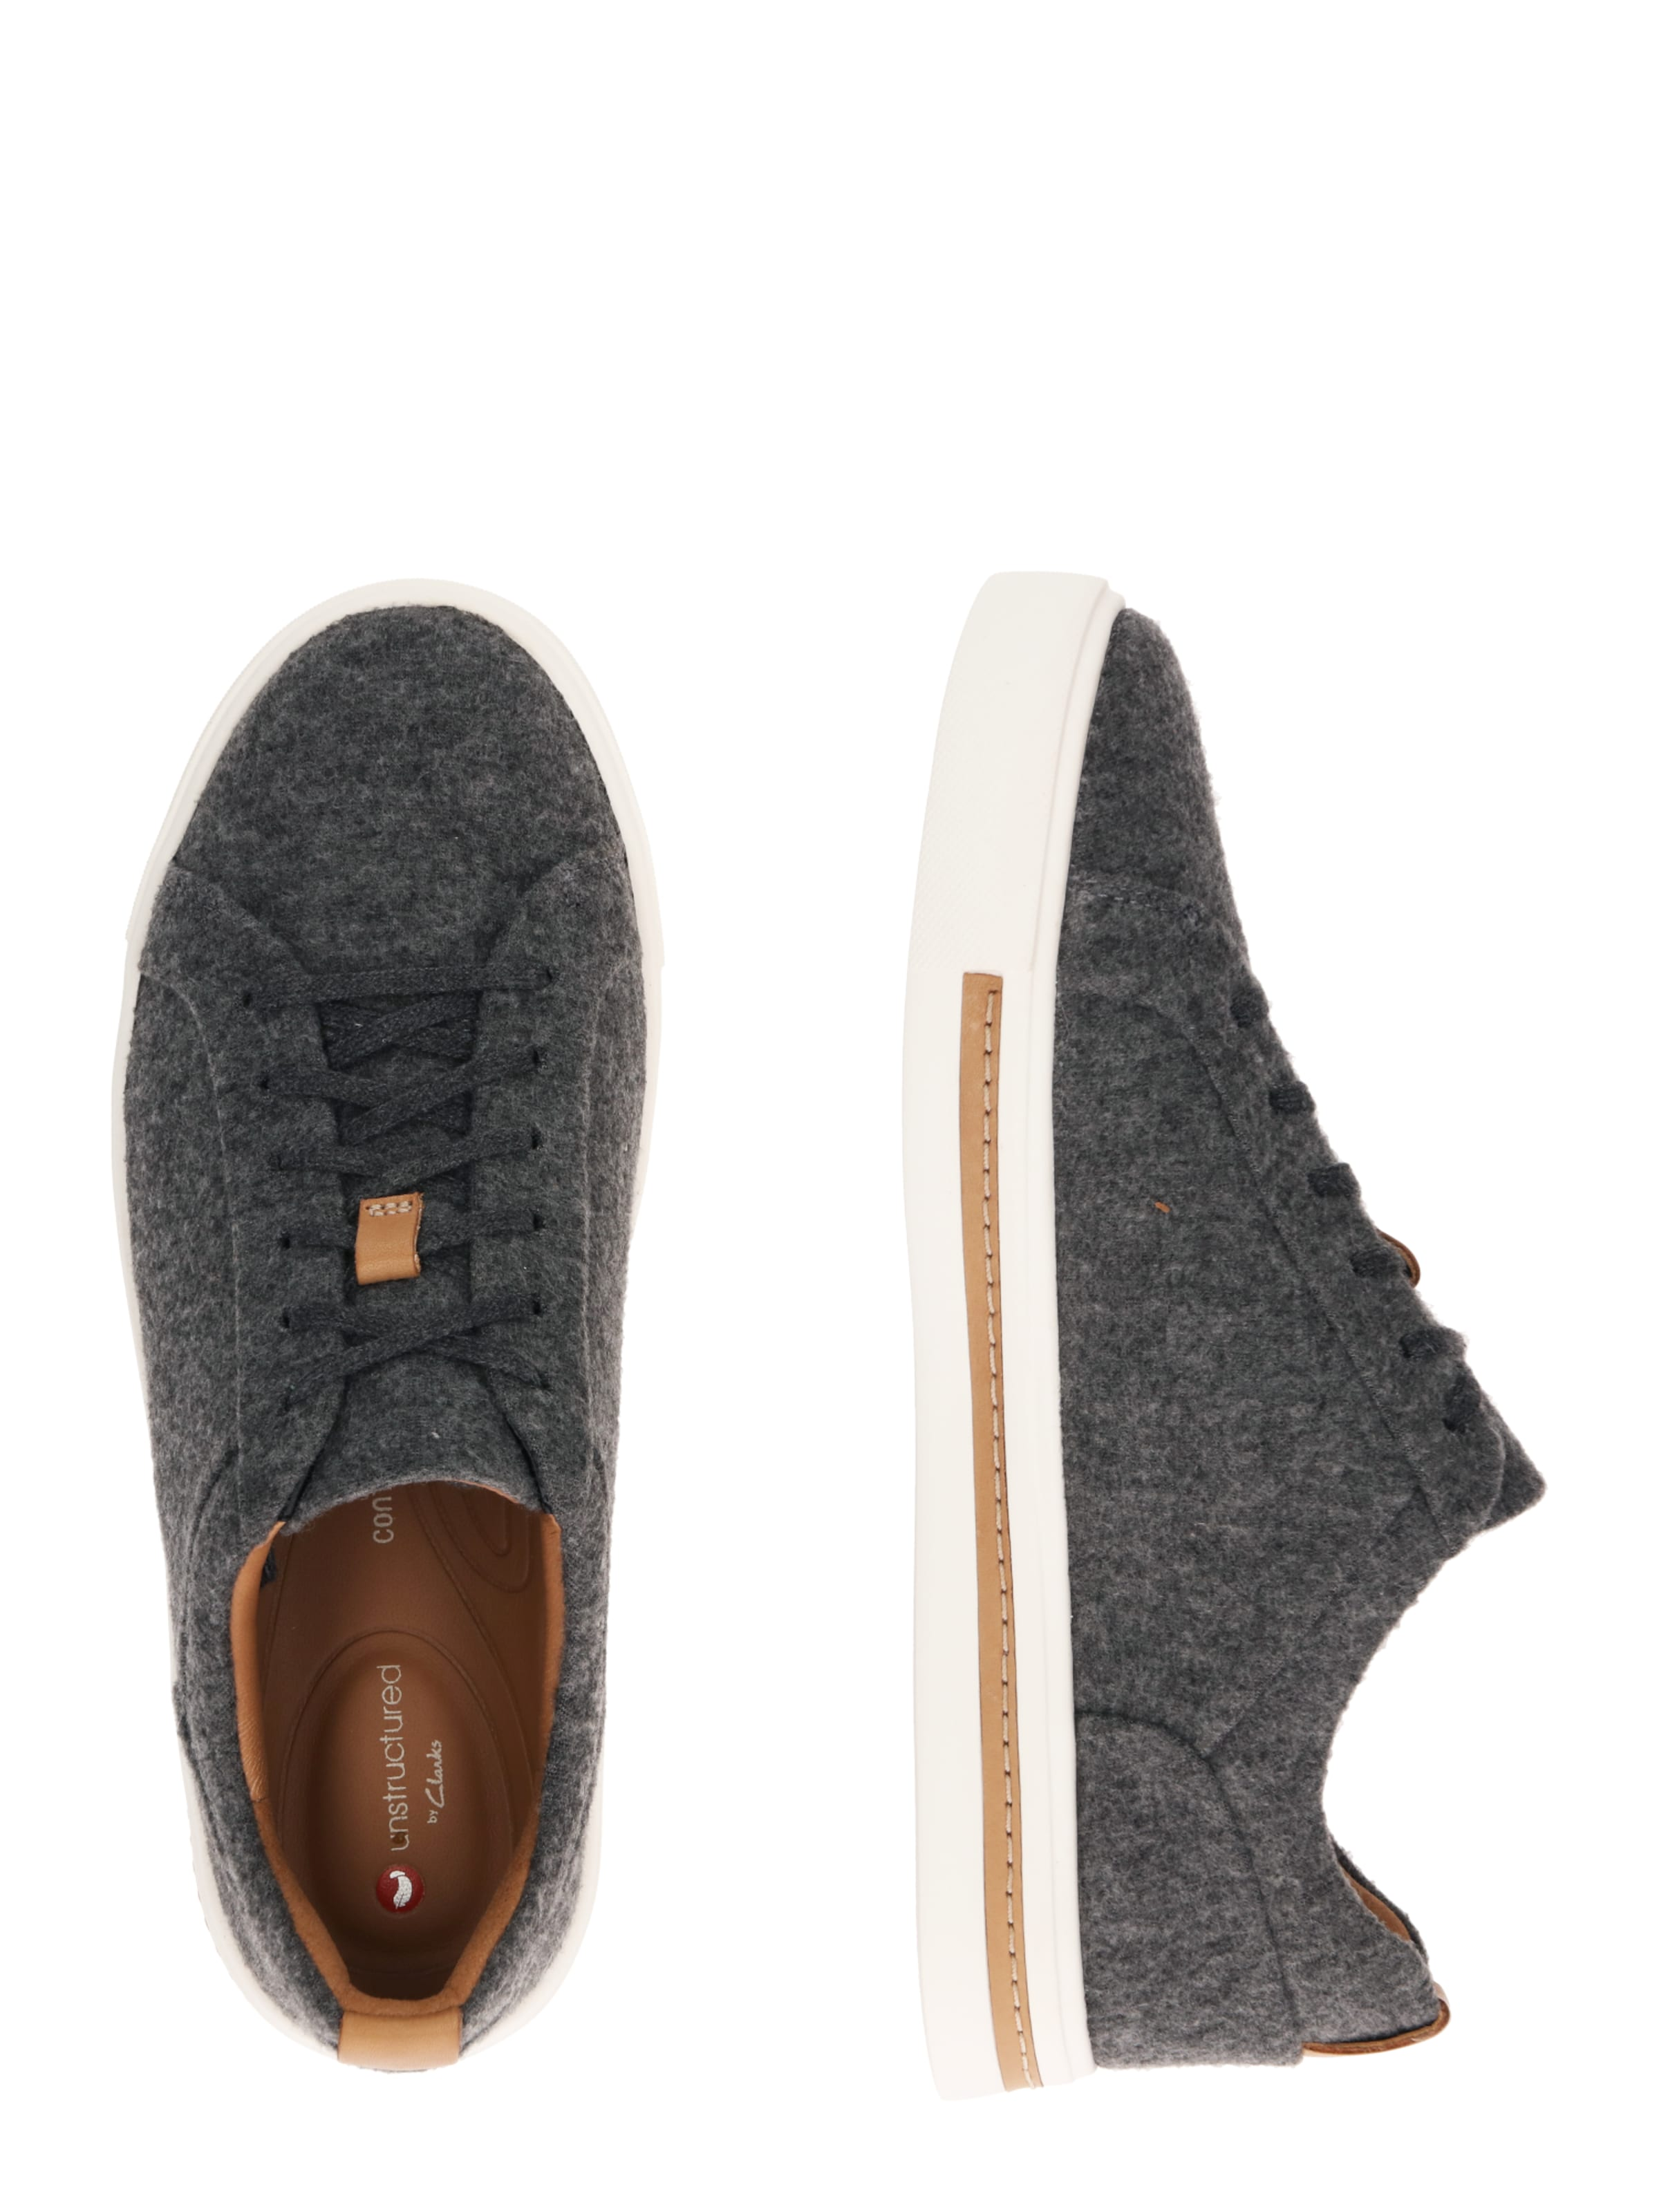 Sneaker Clarks Lace' Maui 'un Weiß In GrauRot fg7yb6